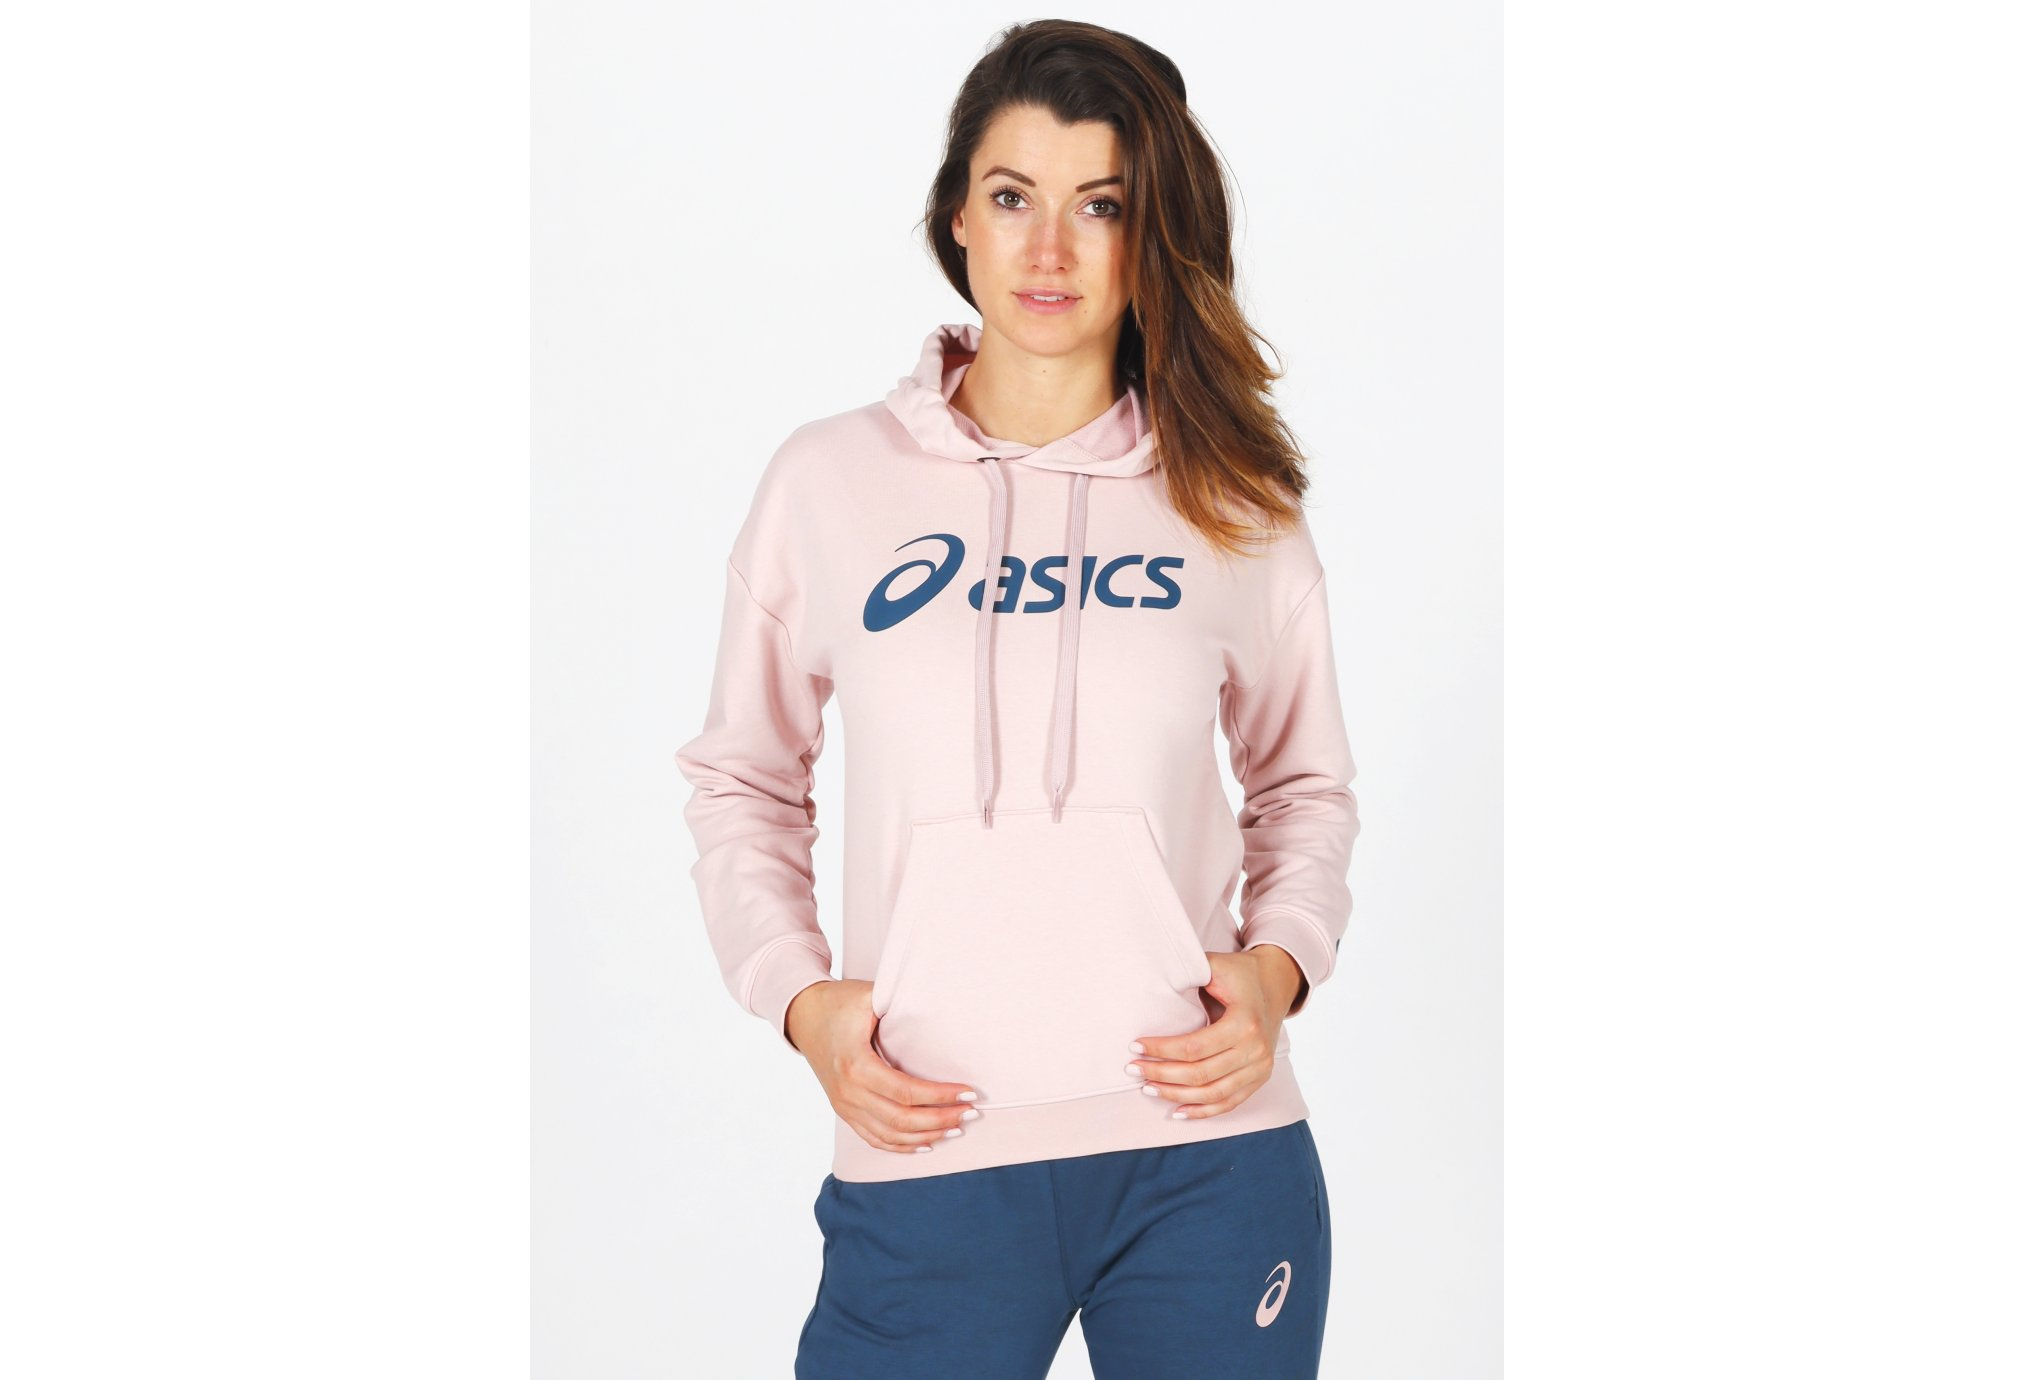 Asics Big Asics OTH W vêtement running femme